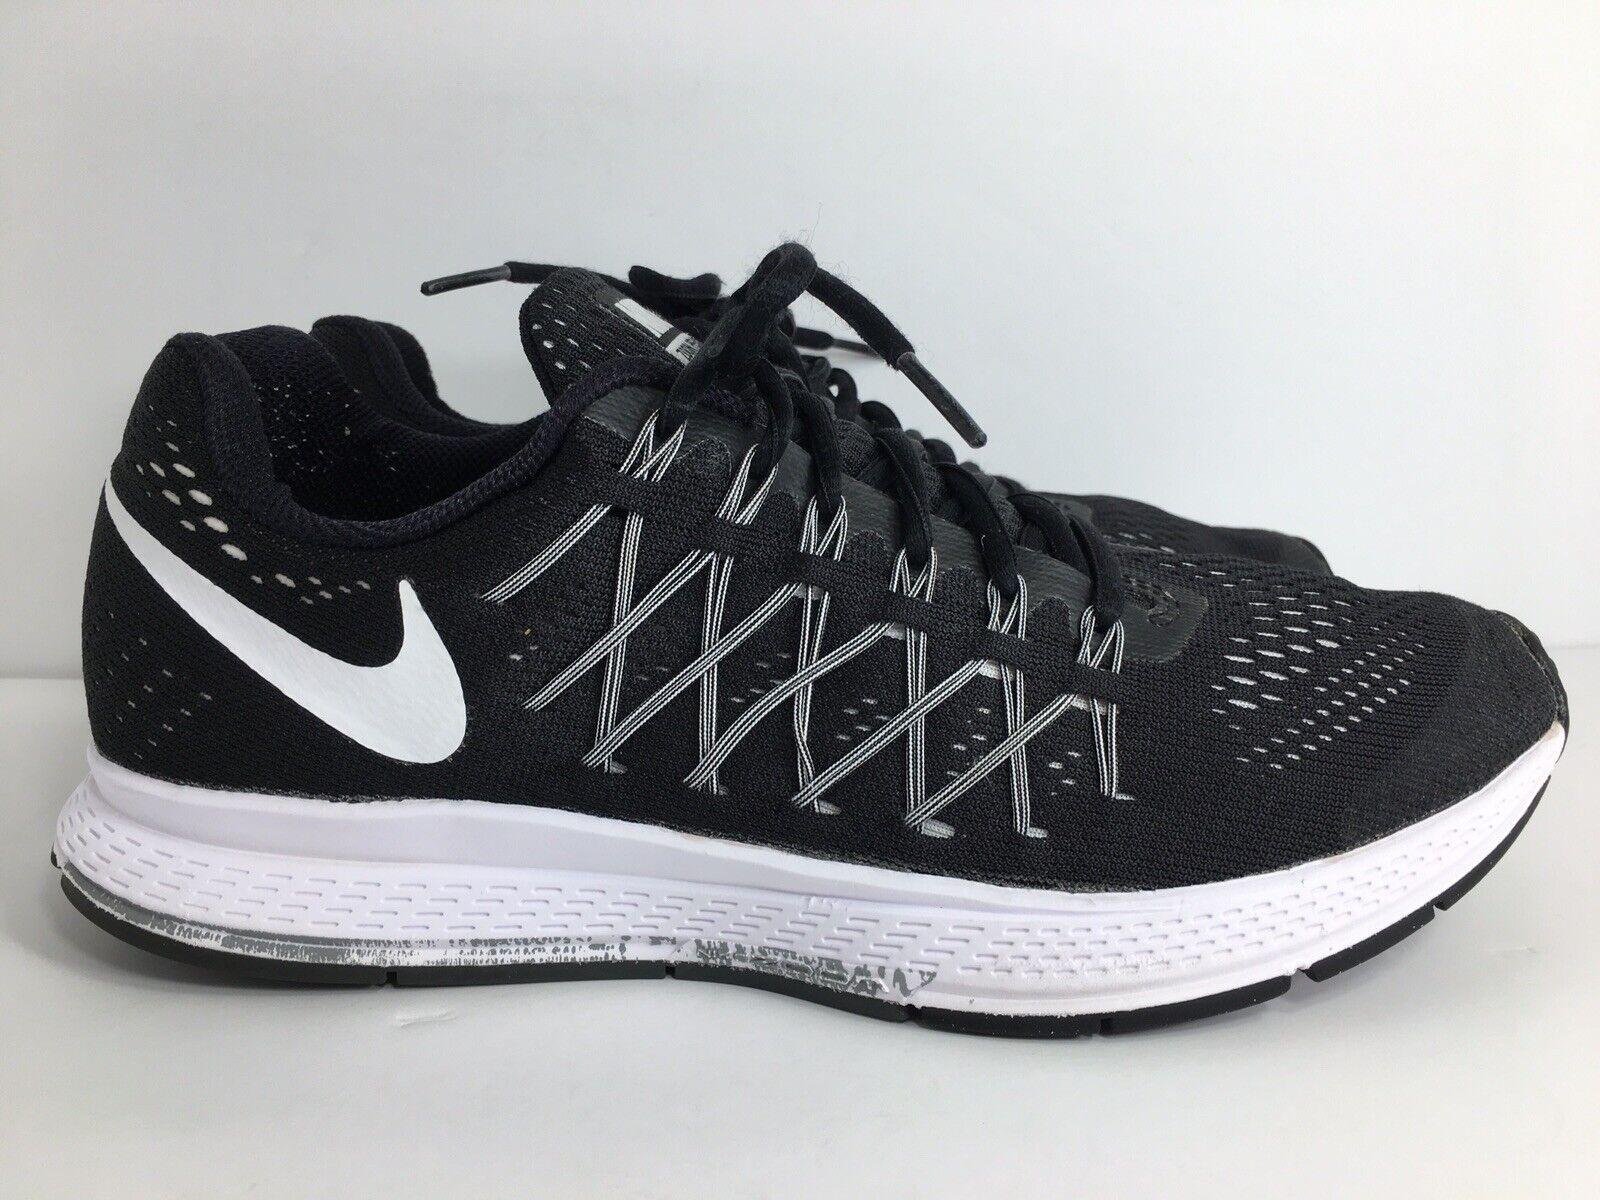 Nouveaux produits a6cc6 fa8bd Nike Air Zoom Pegasus 32 Running Shoes Black White Dark Grey 749340 001